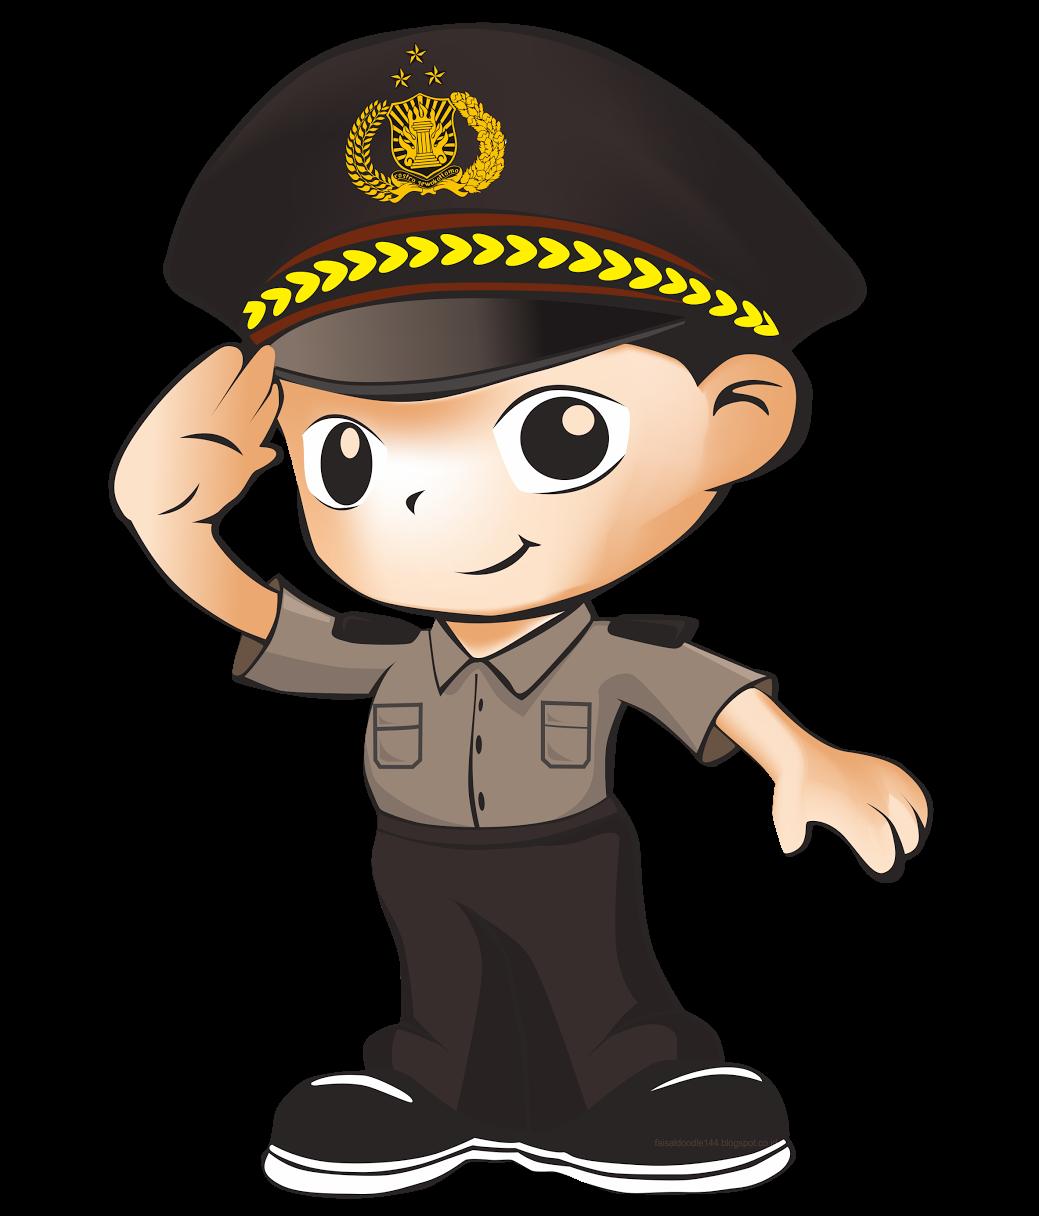 LOGO / MASKOT PROMOTER POLRI Polisi, Pendidikan